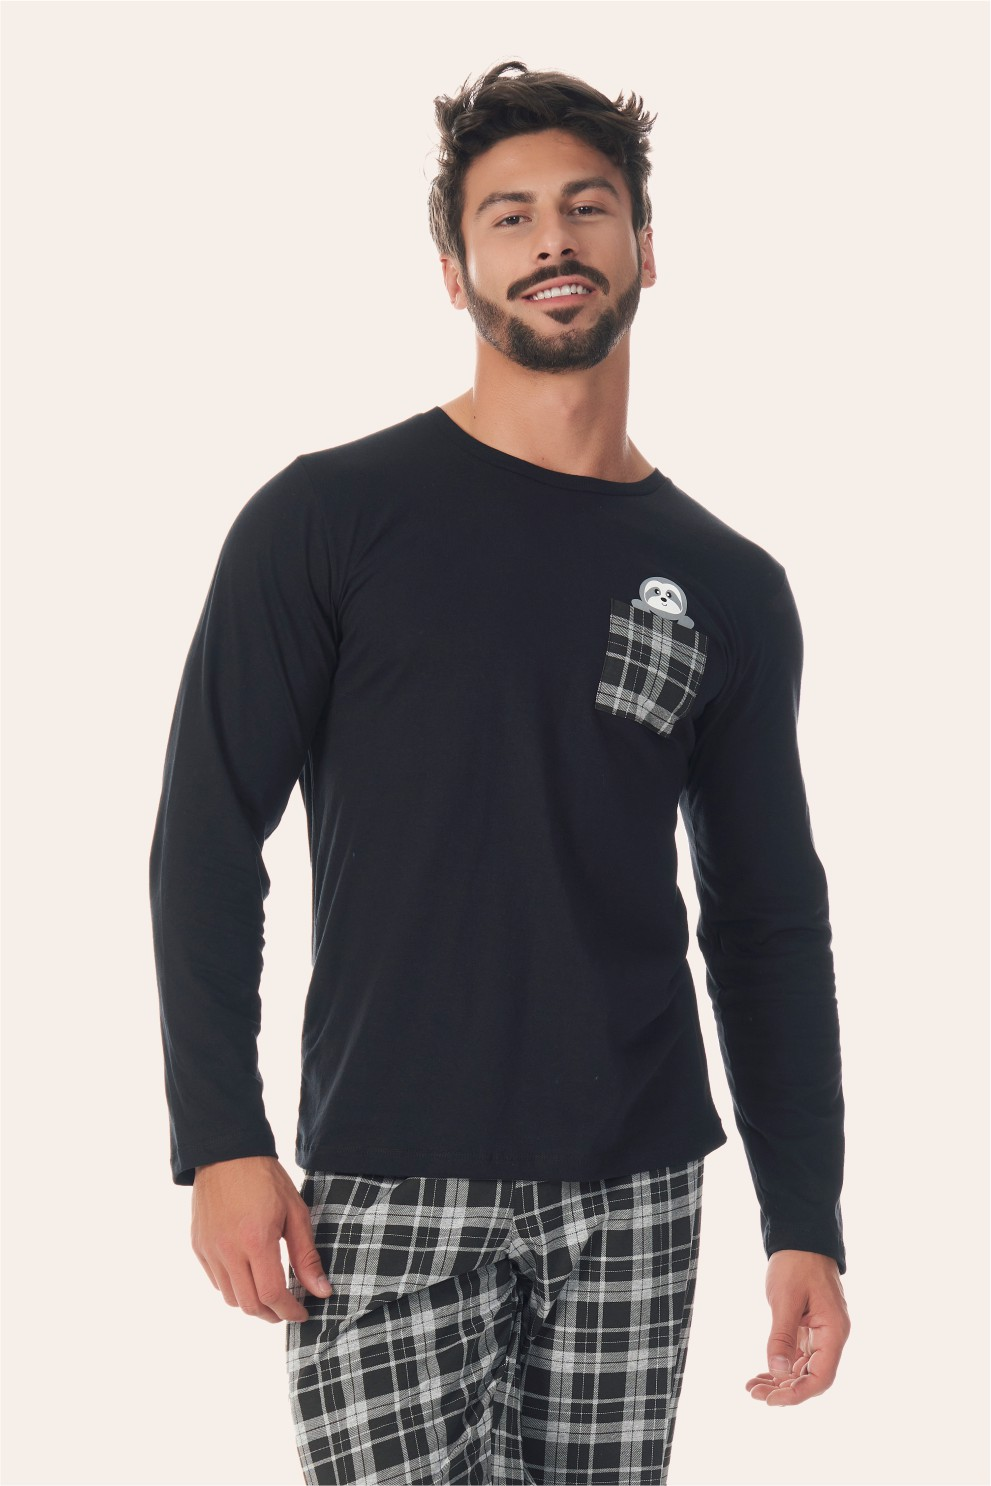 002/D - Pijama Adulto Masculino Xadrez Preto